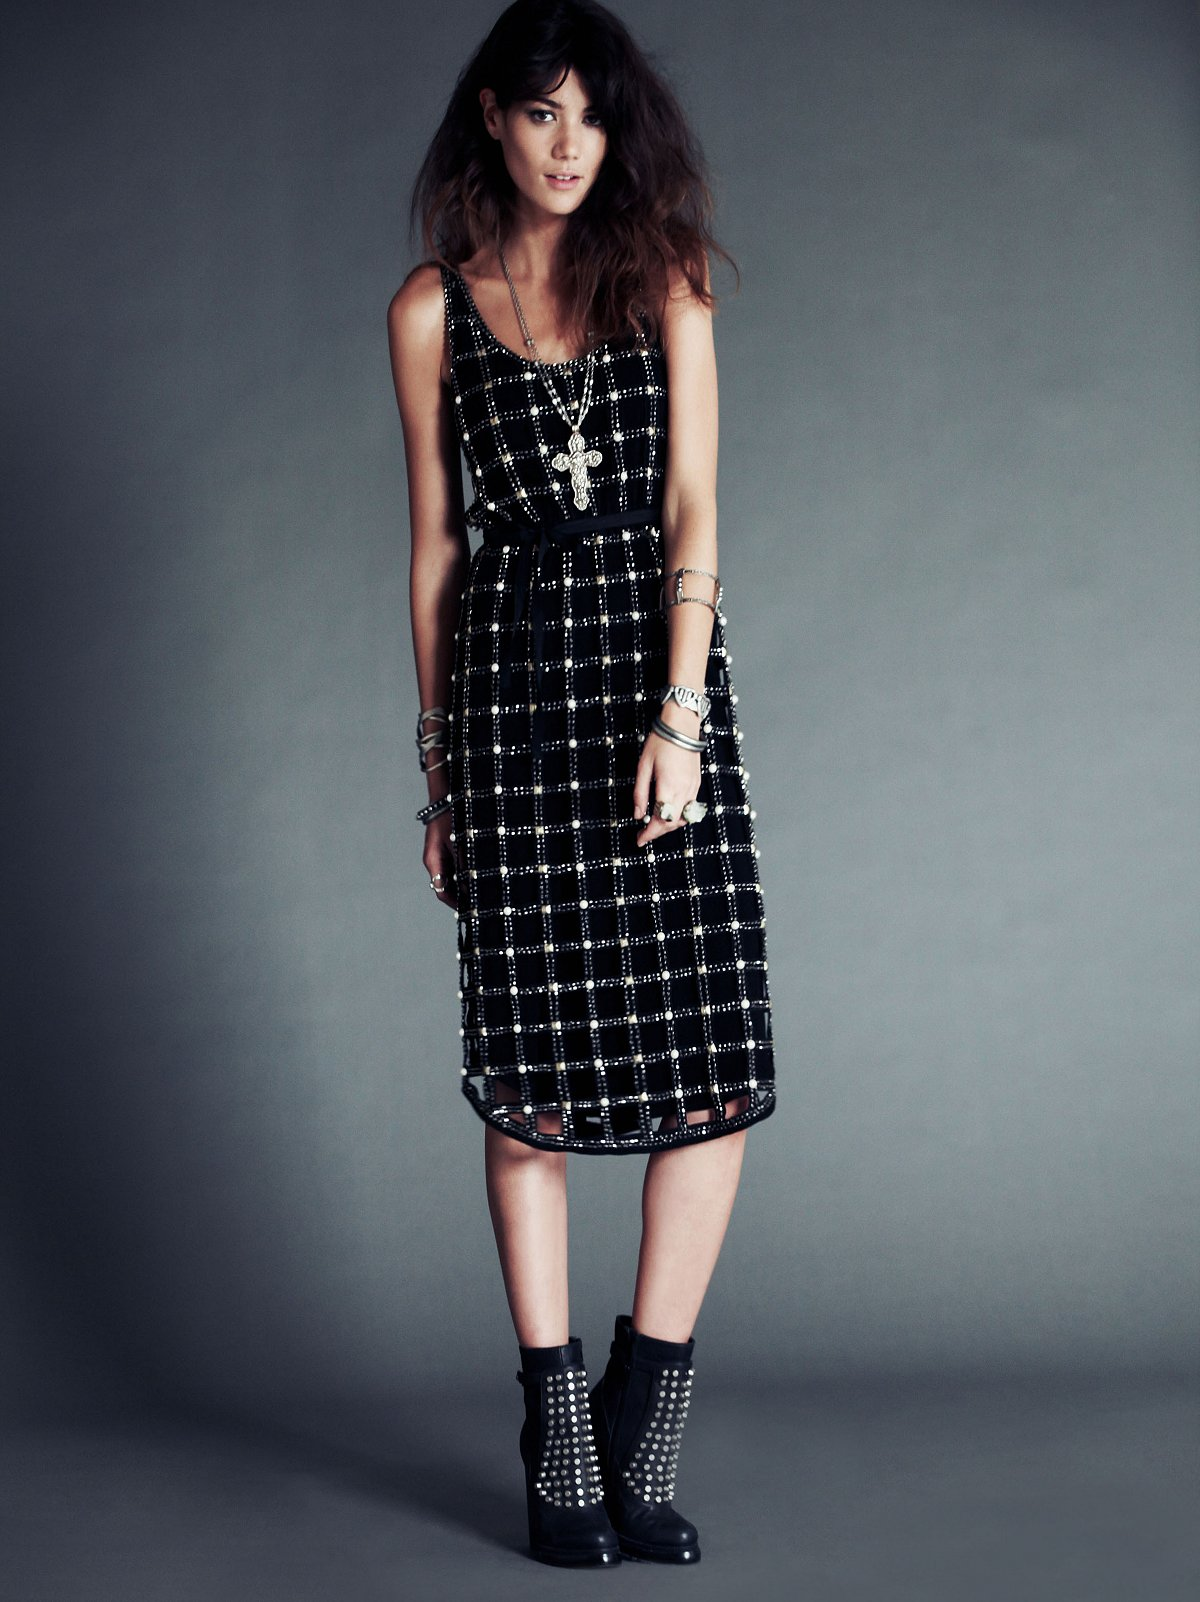 FP New Romantics Material Girl Lattice Dress